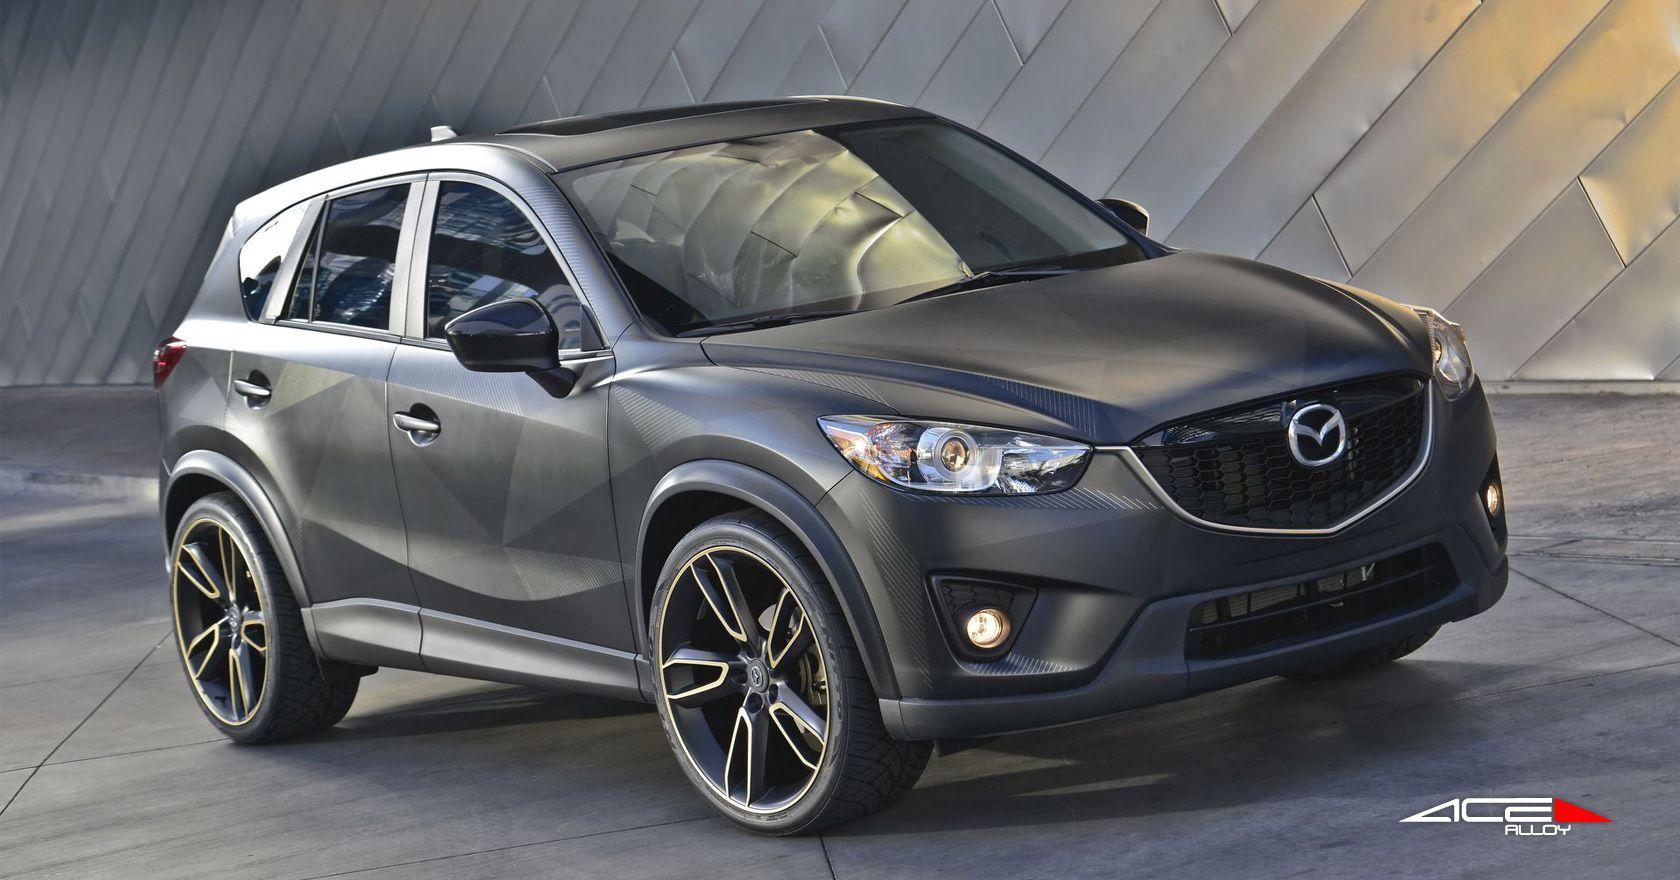 22 Wheel Matte Black Scorpio C902 Mazda Cx 5 Urban Avail White Silver Mazda Mazda Cx5 Black Scorpio